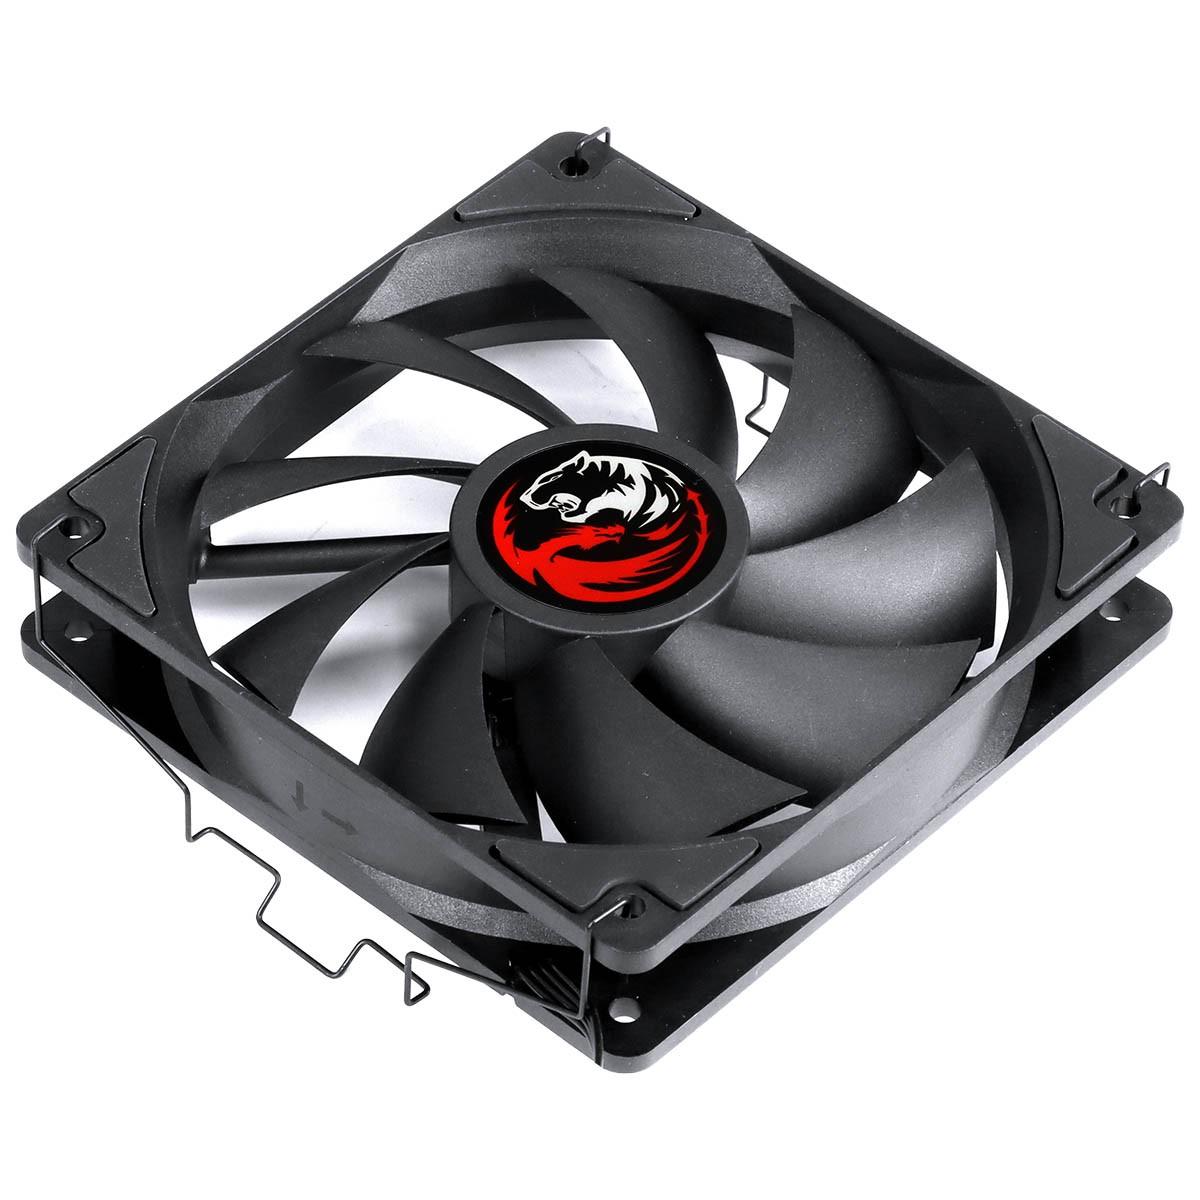 Cooler para Processador PCYES Nótus B, 120mm, Intel-AMD, PCYACNB